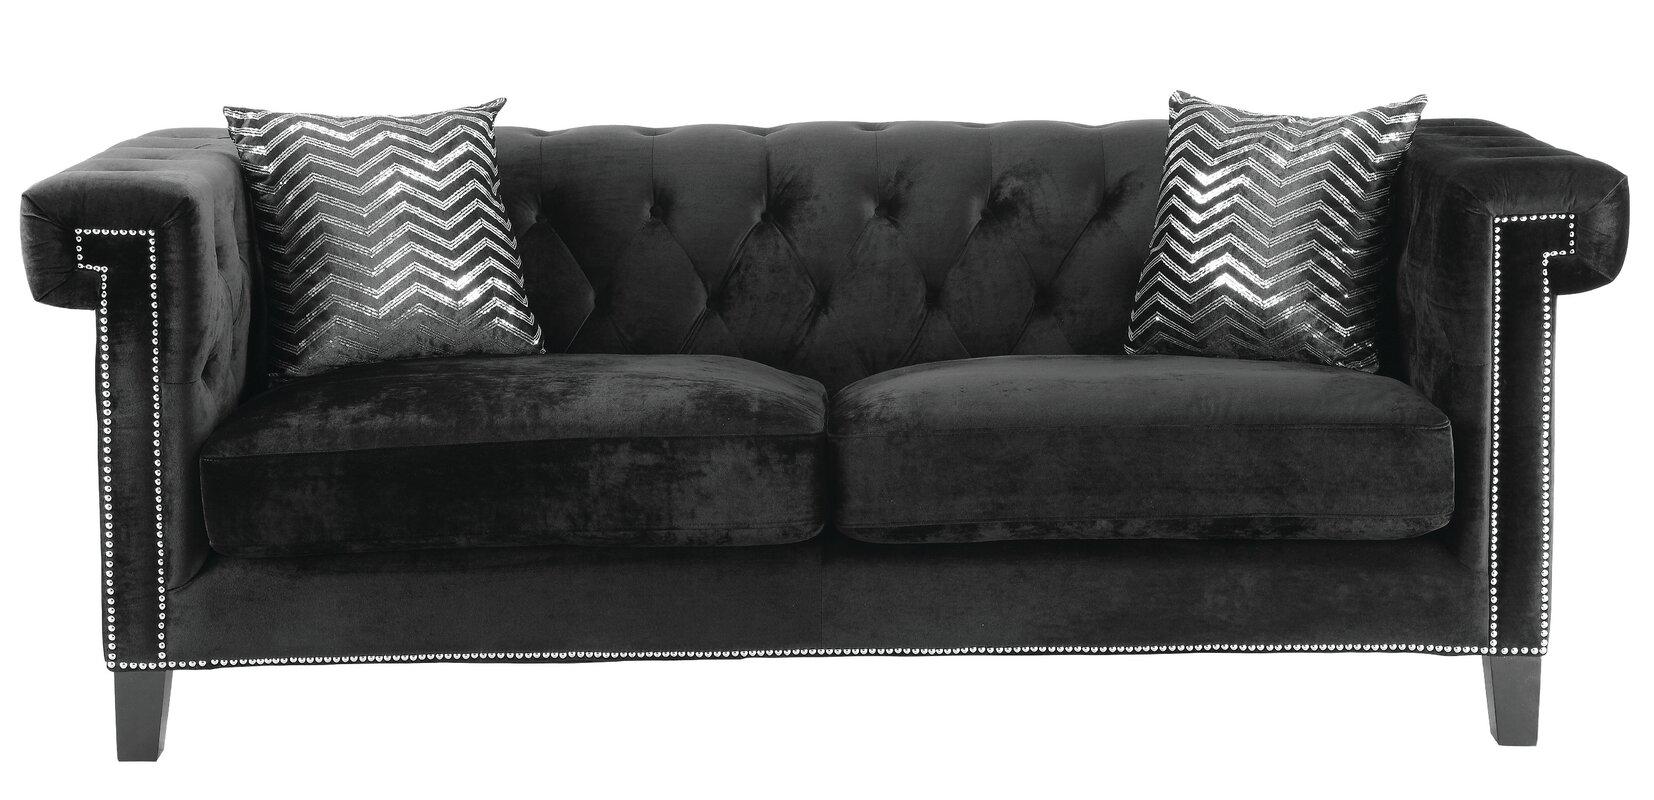 Grosvenor Chesterfield Sofa